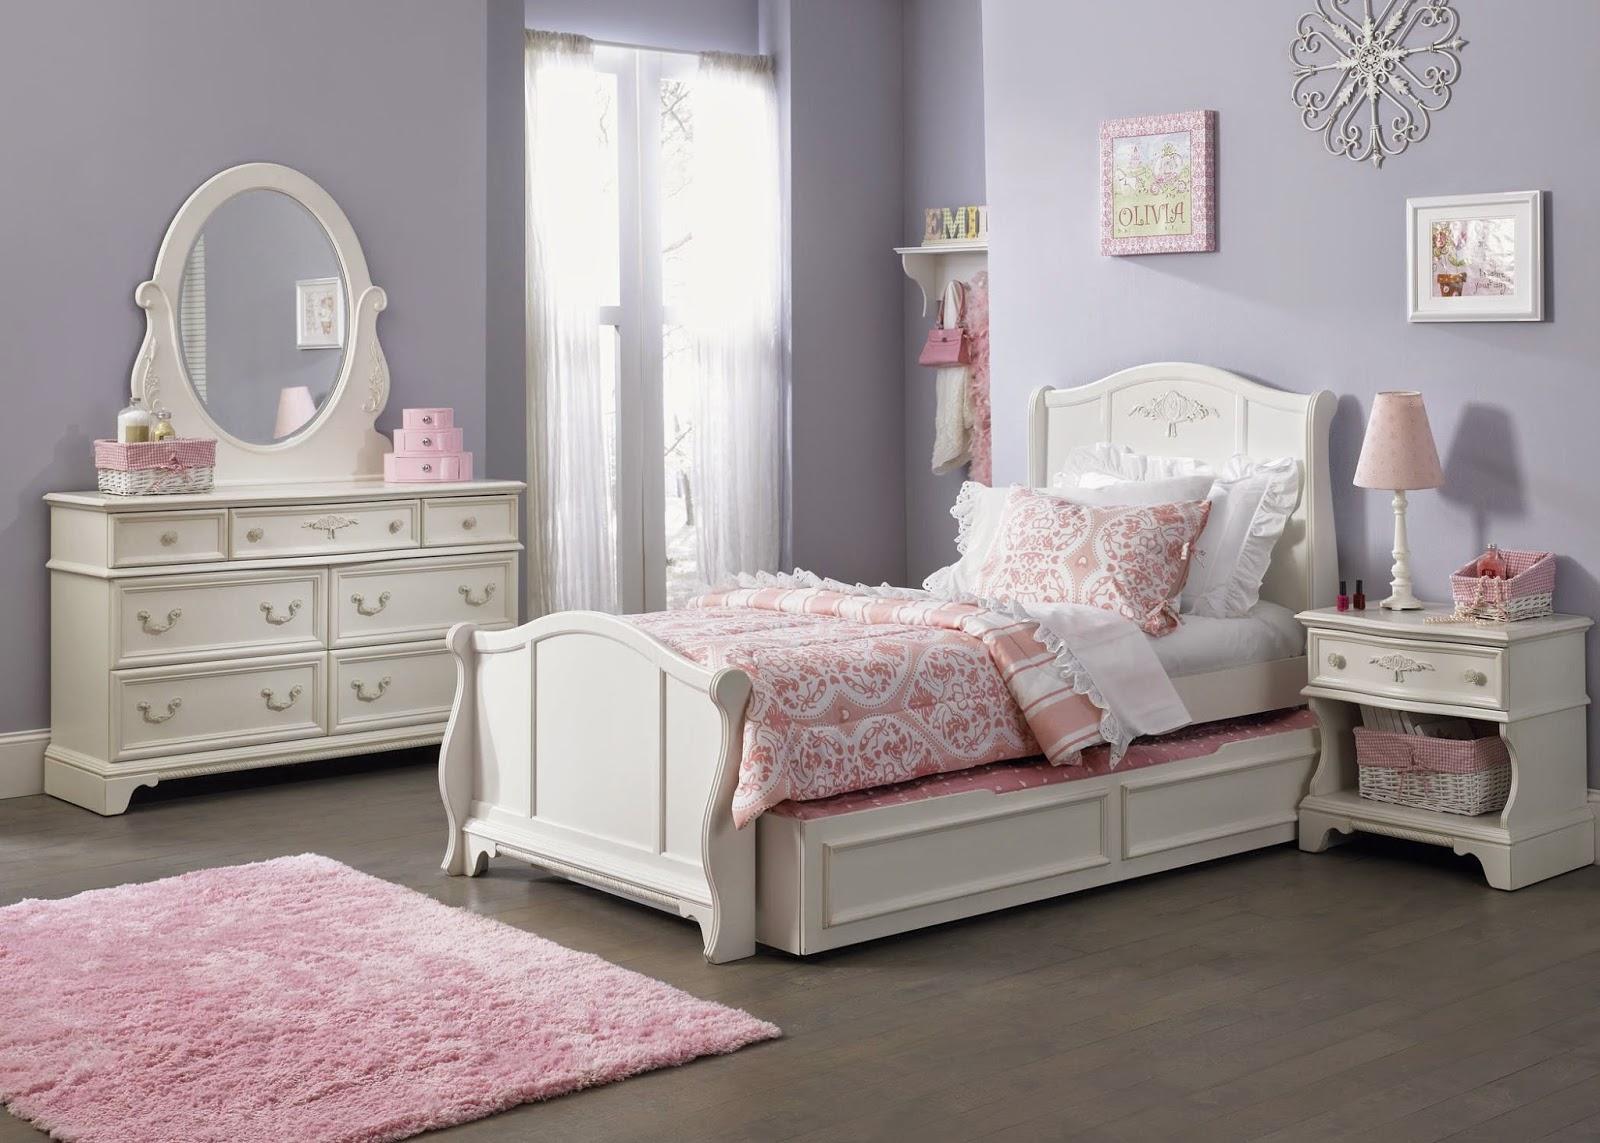 Tips de decoraci n de dormitorios juveniles for Decoracion de cuartos juveniles